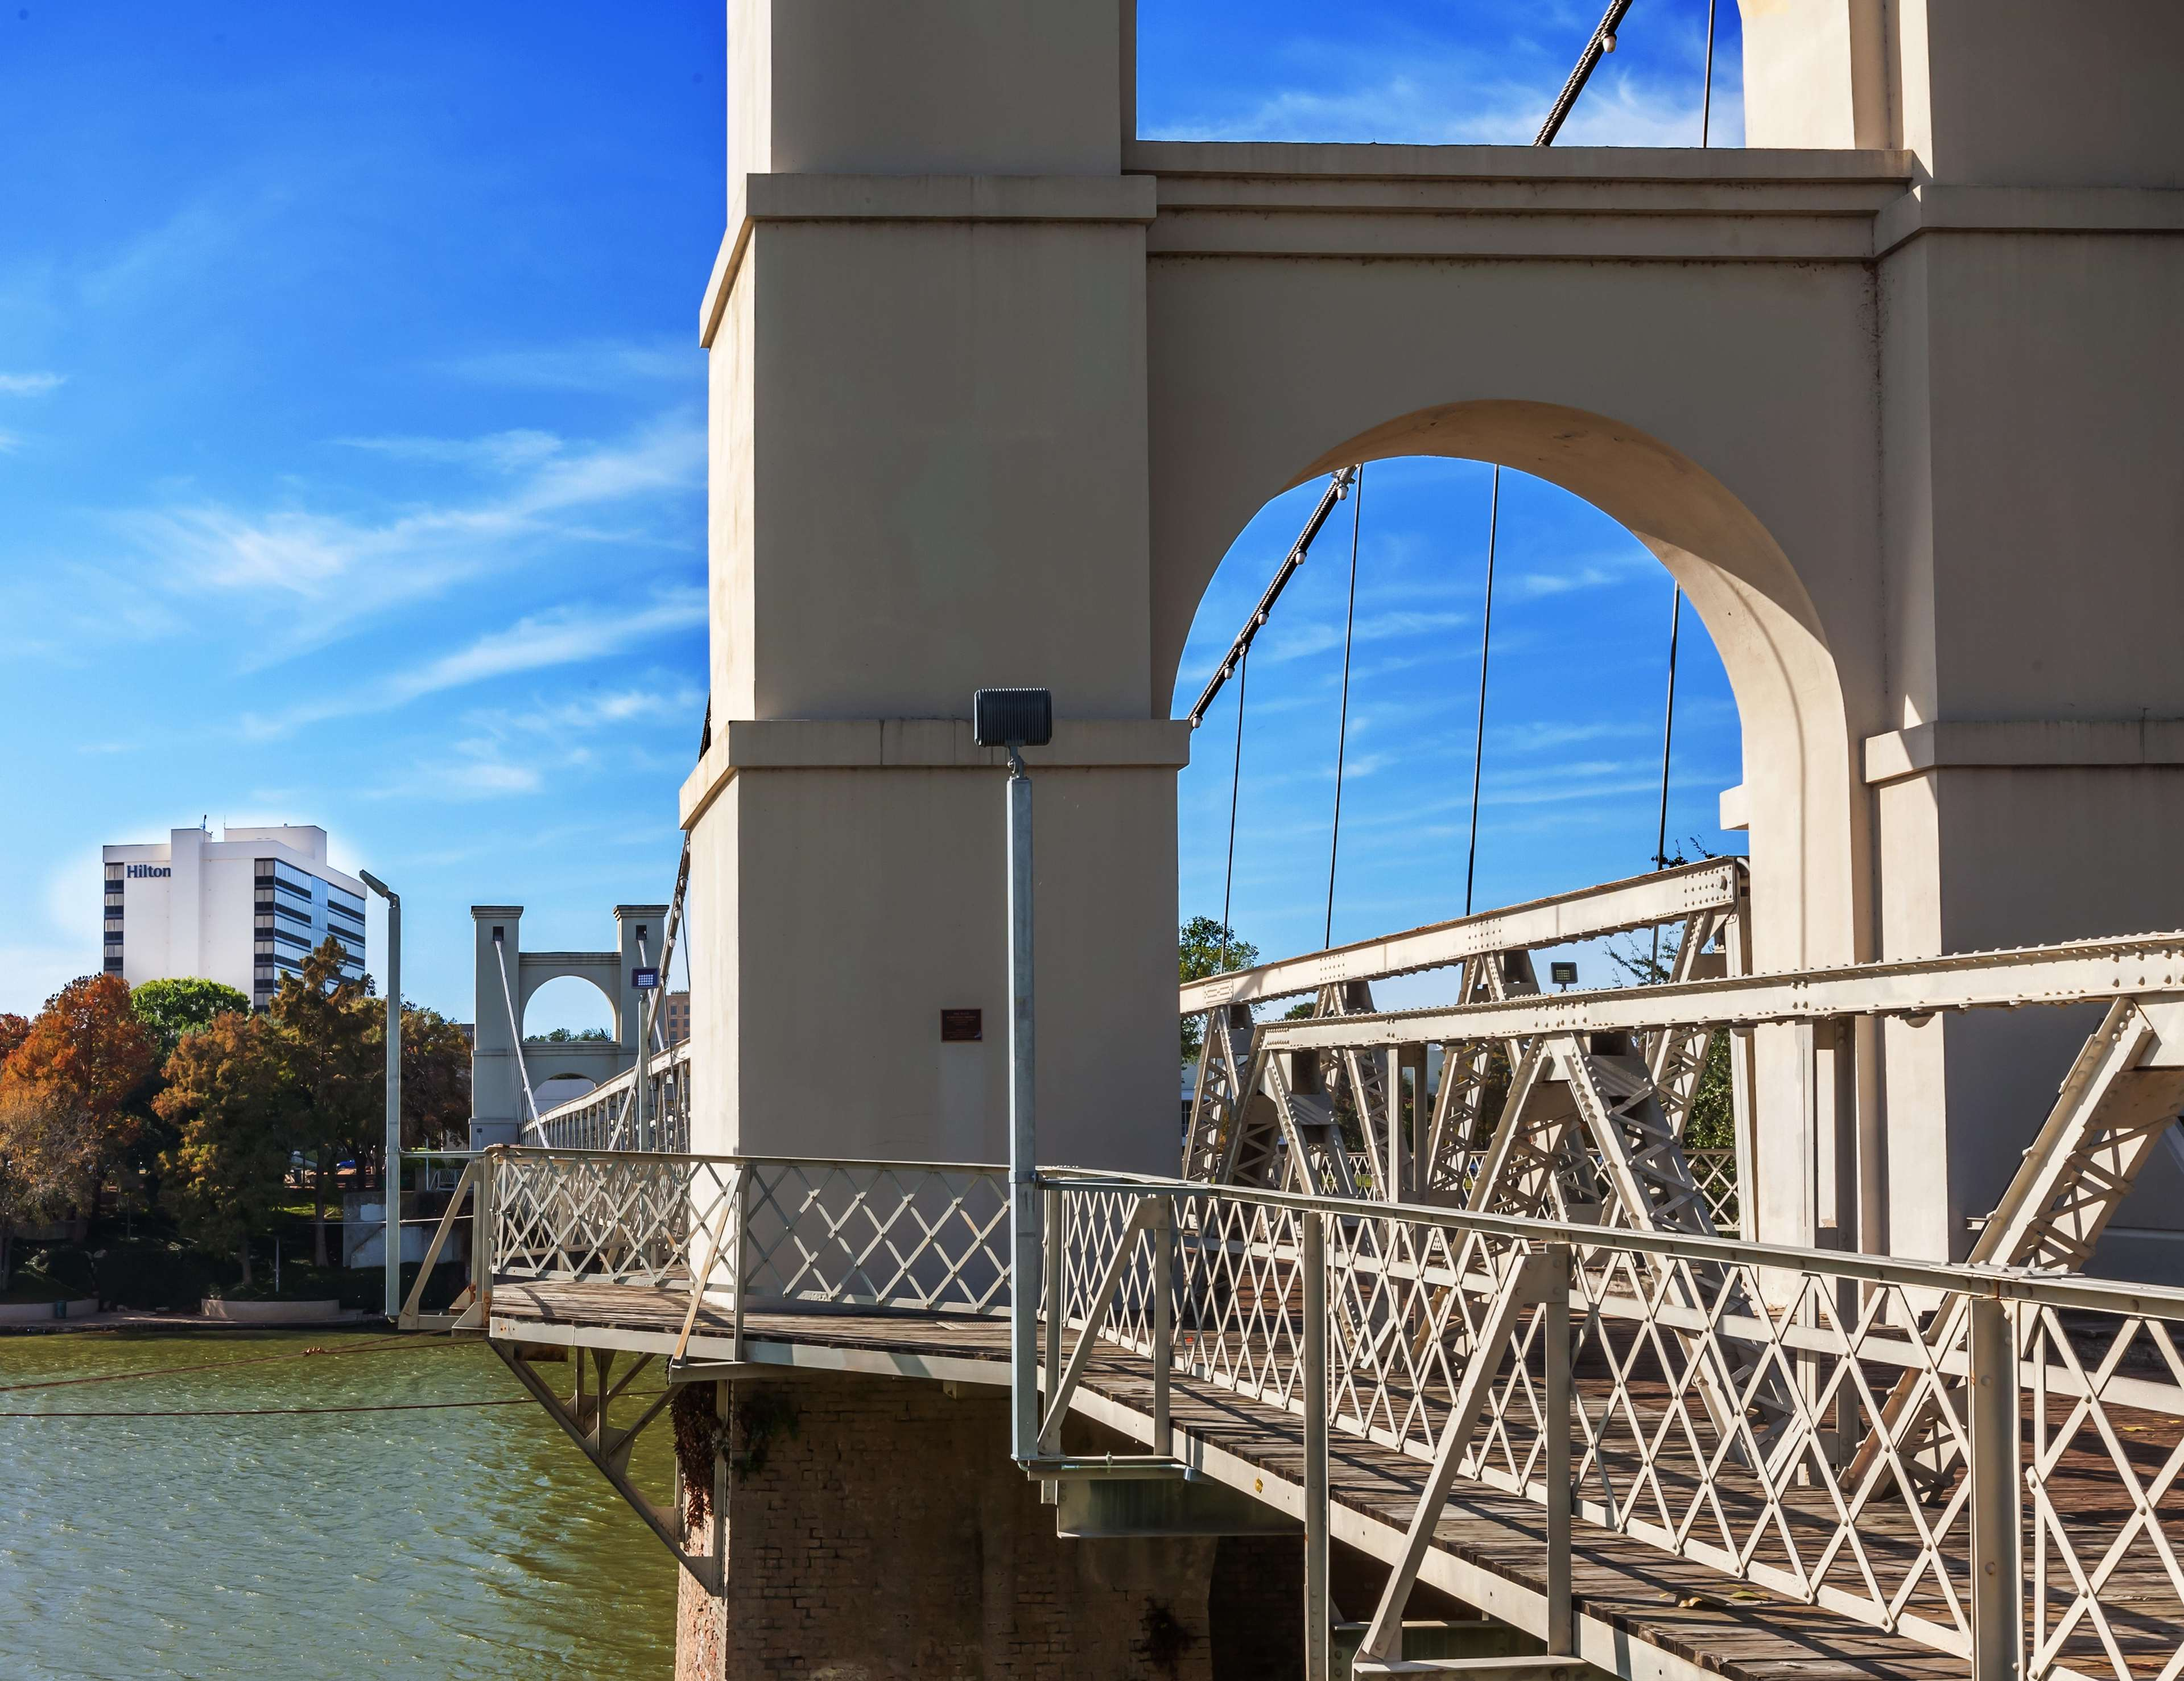 Hilton Waco image 16